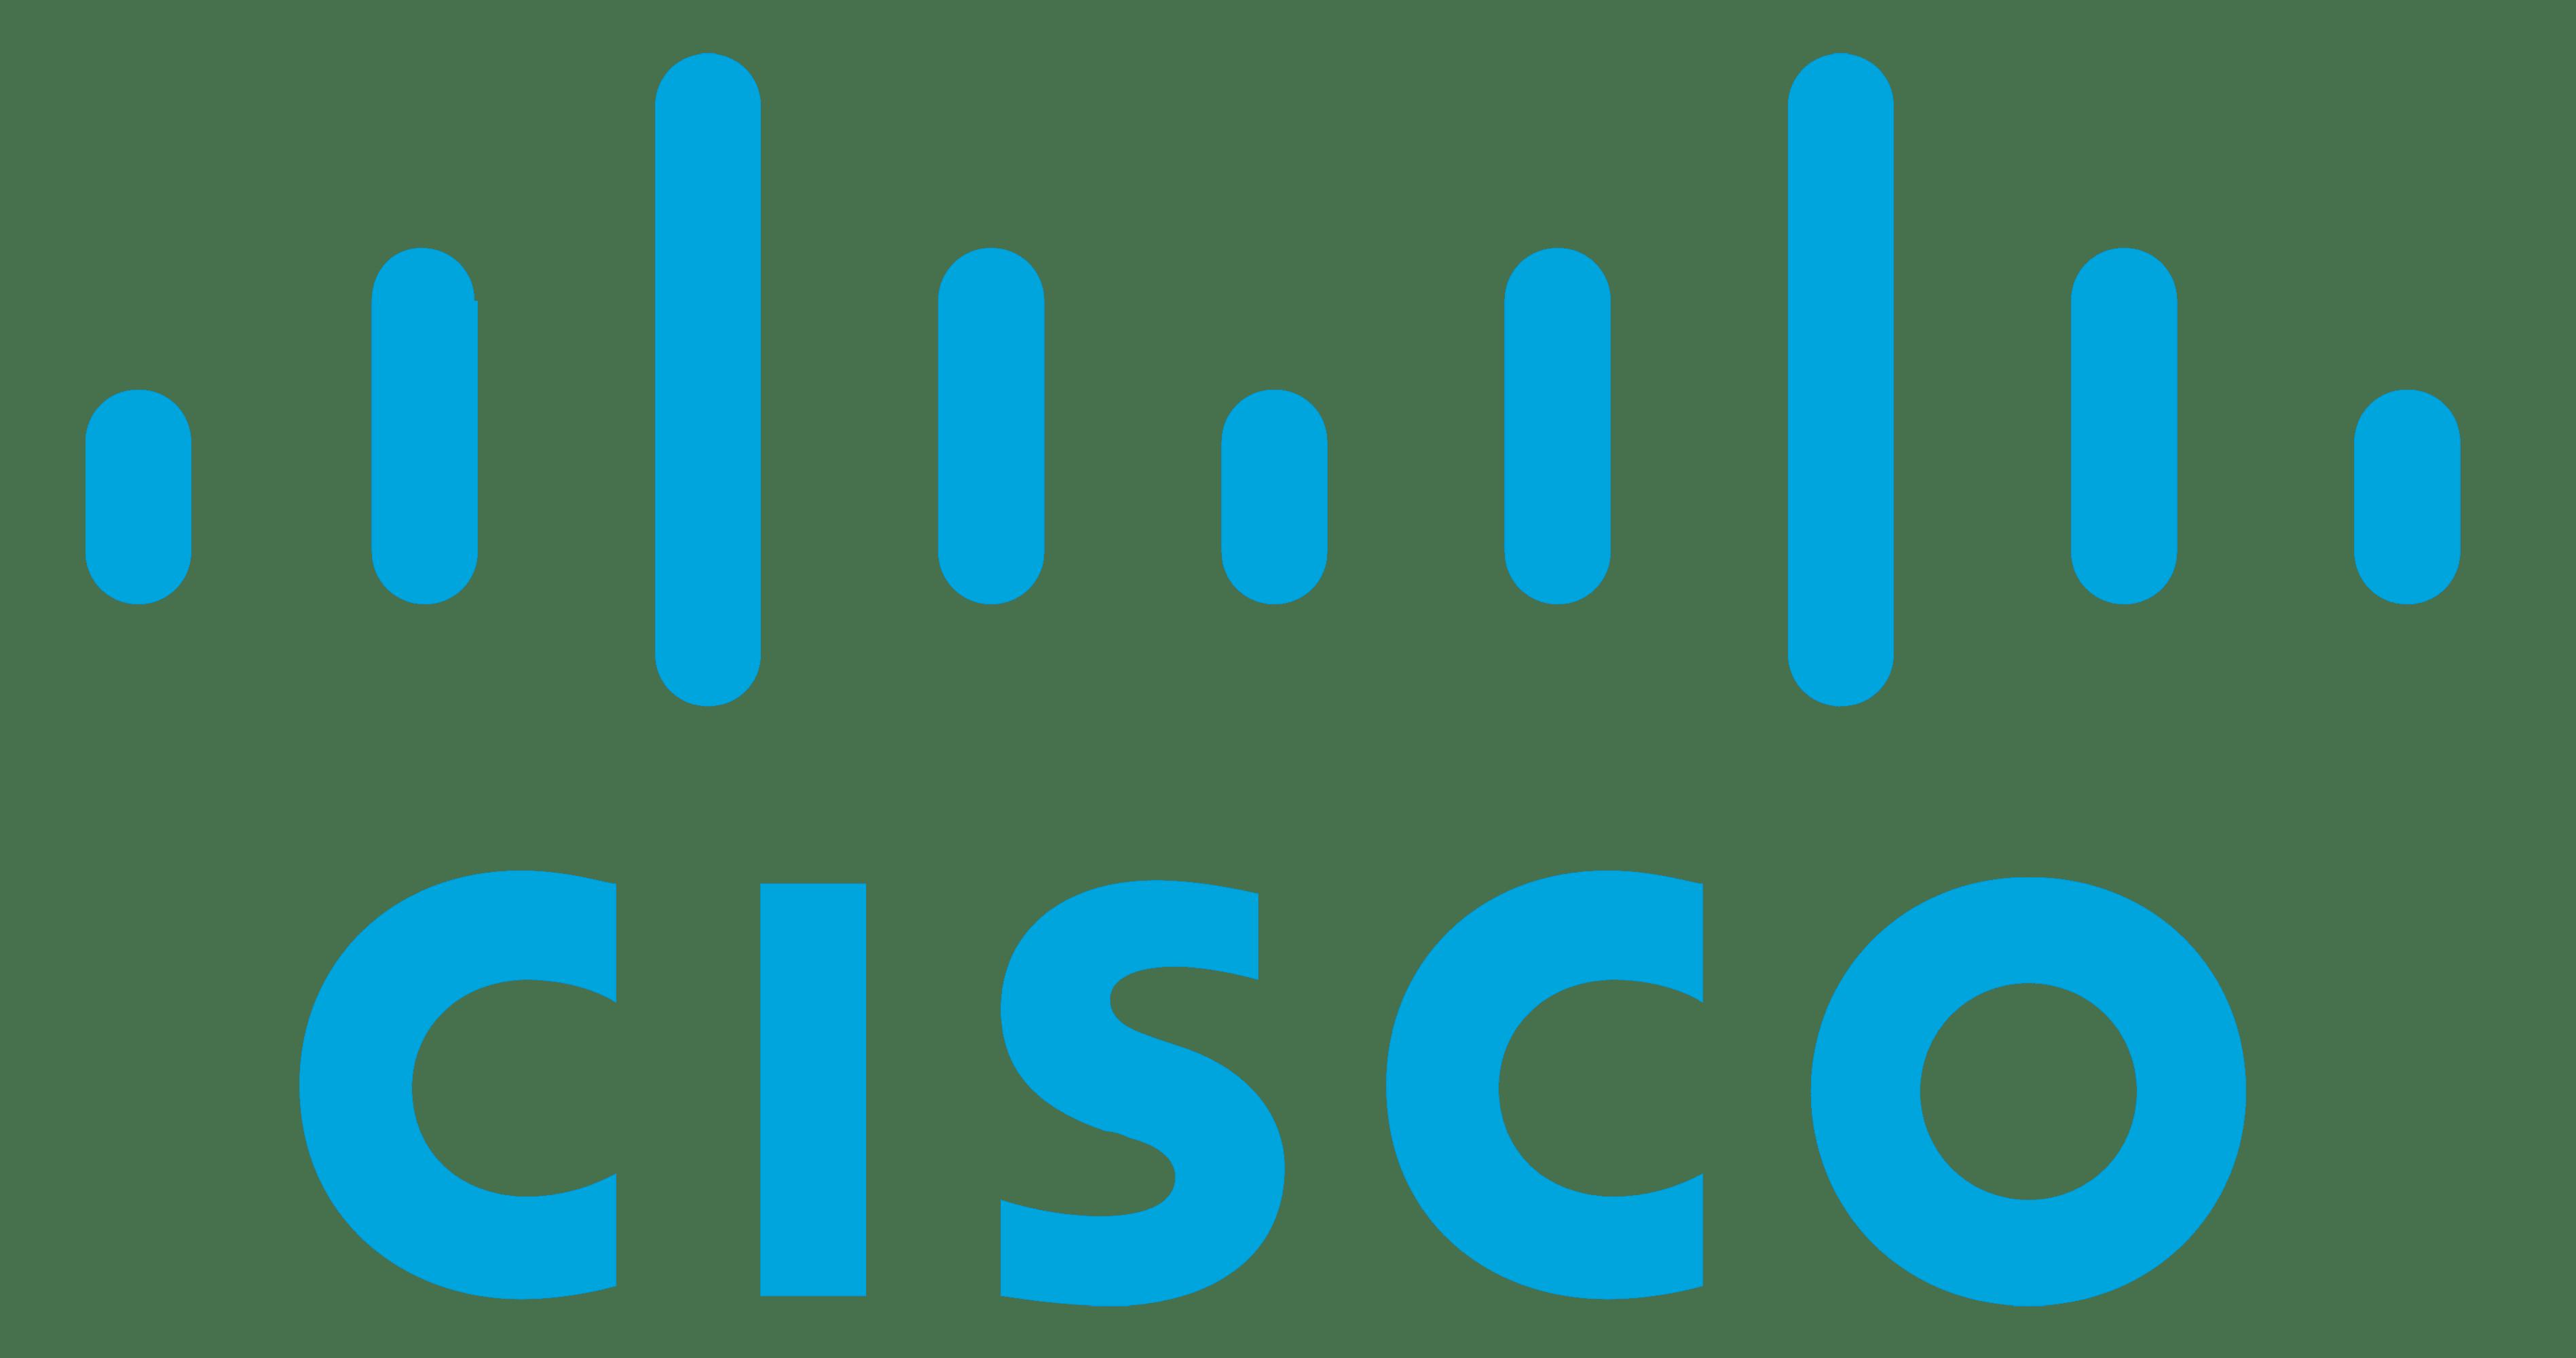 network fundamentals cisco pdf free